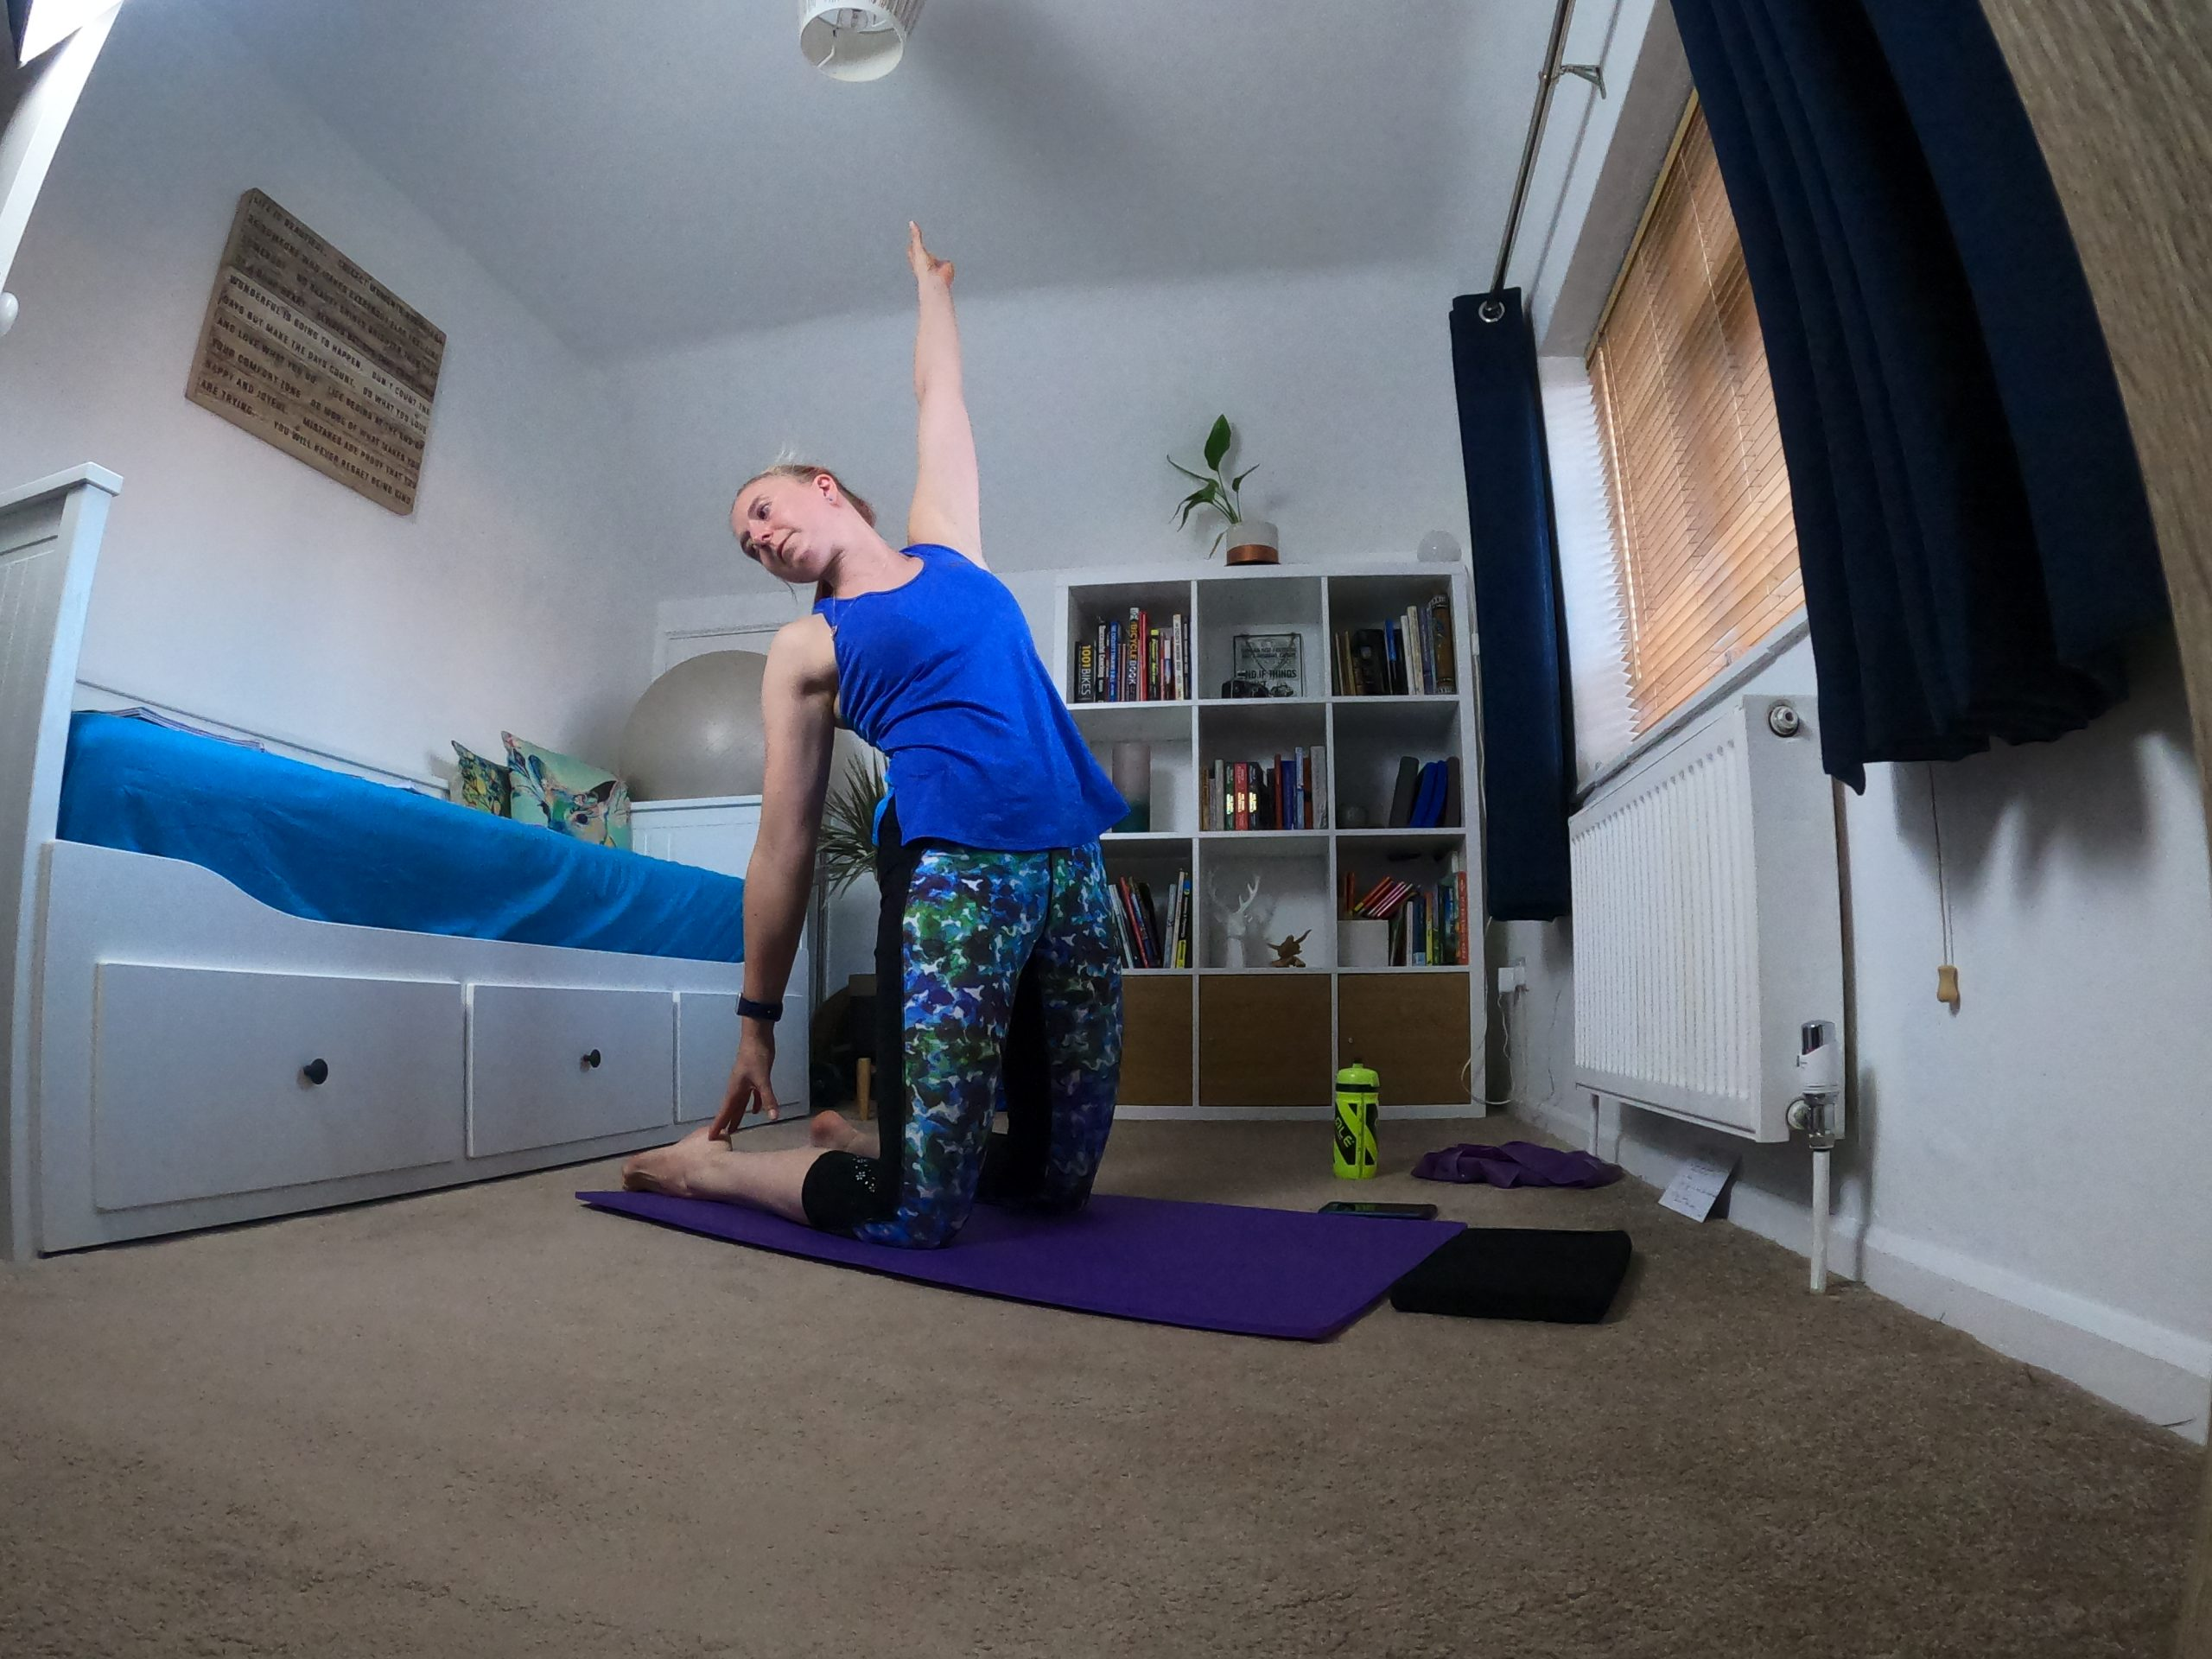 Pilates for flexibility